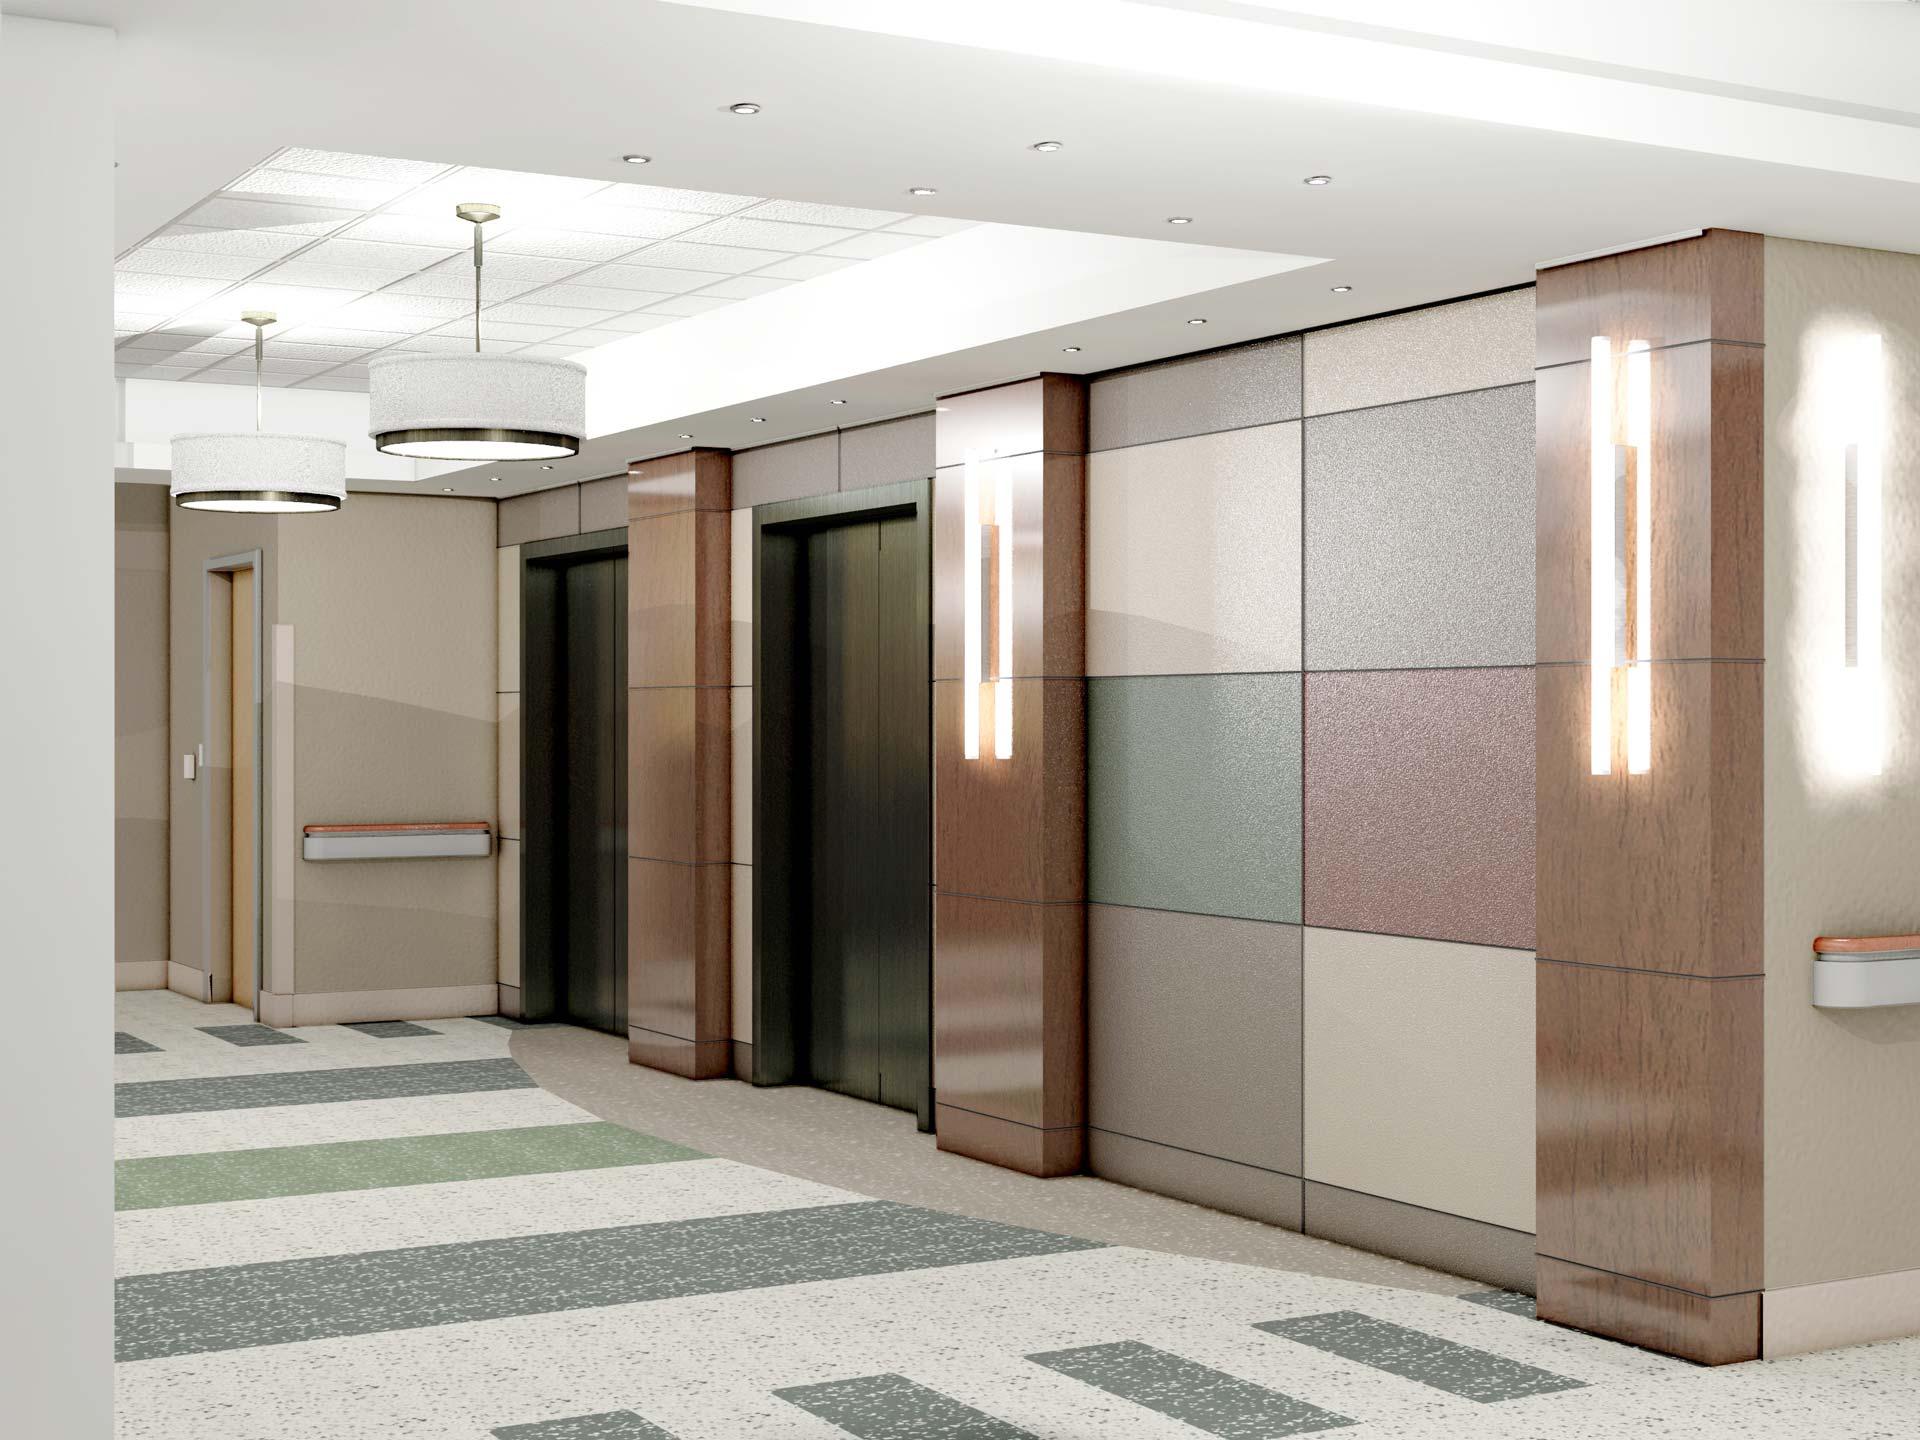 ba-elevator_final_reduced